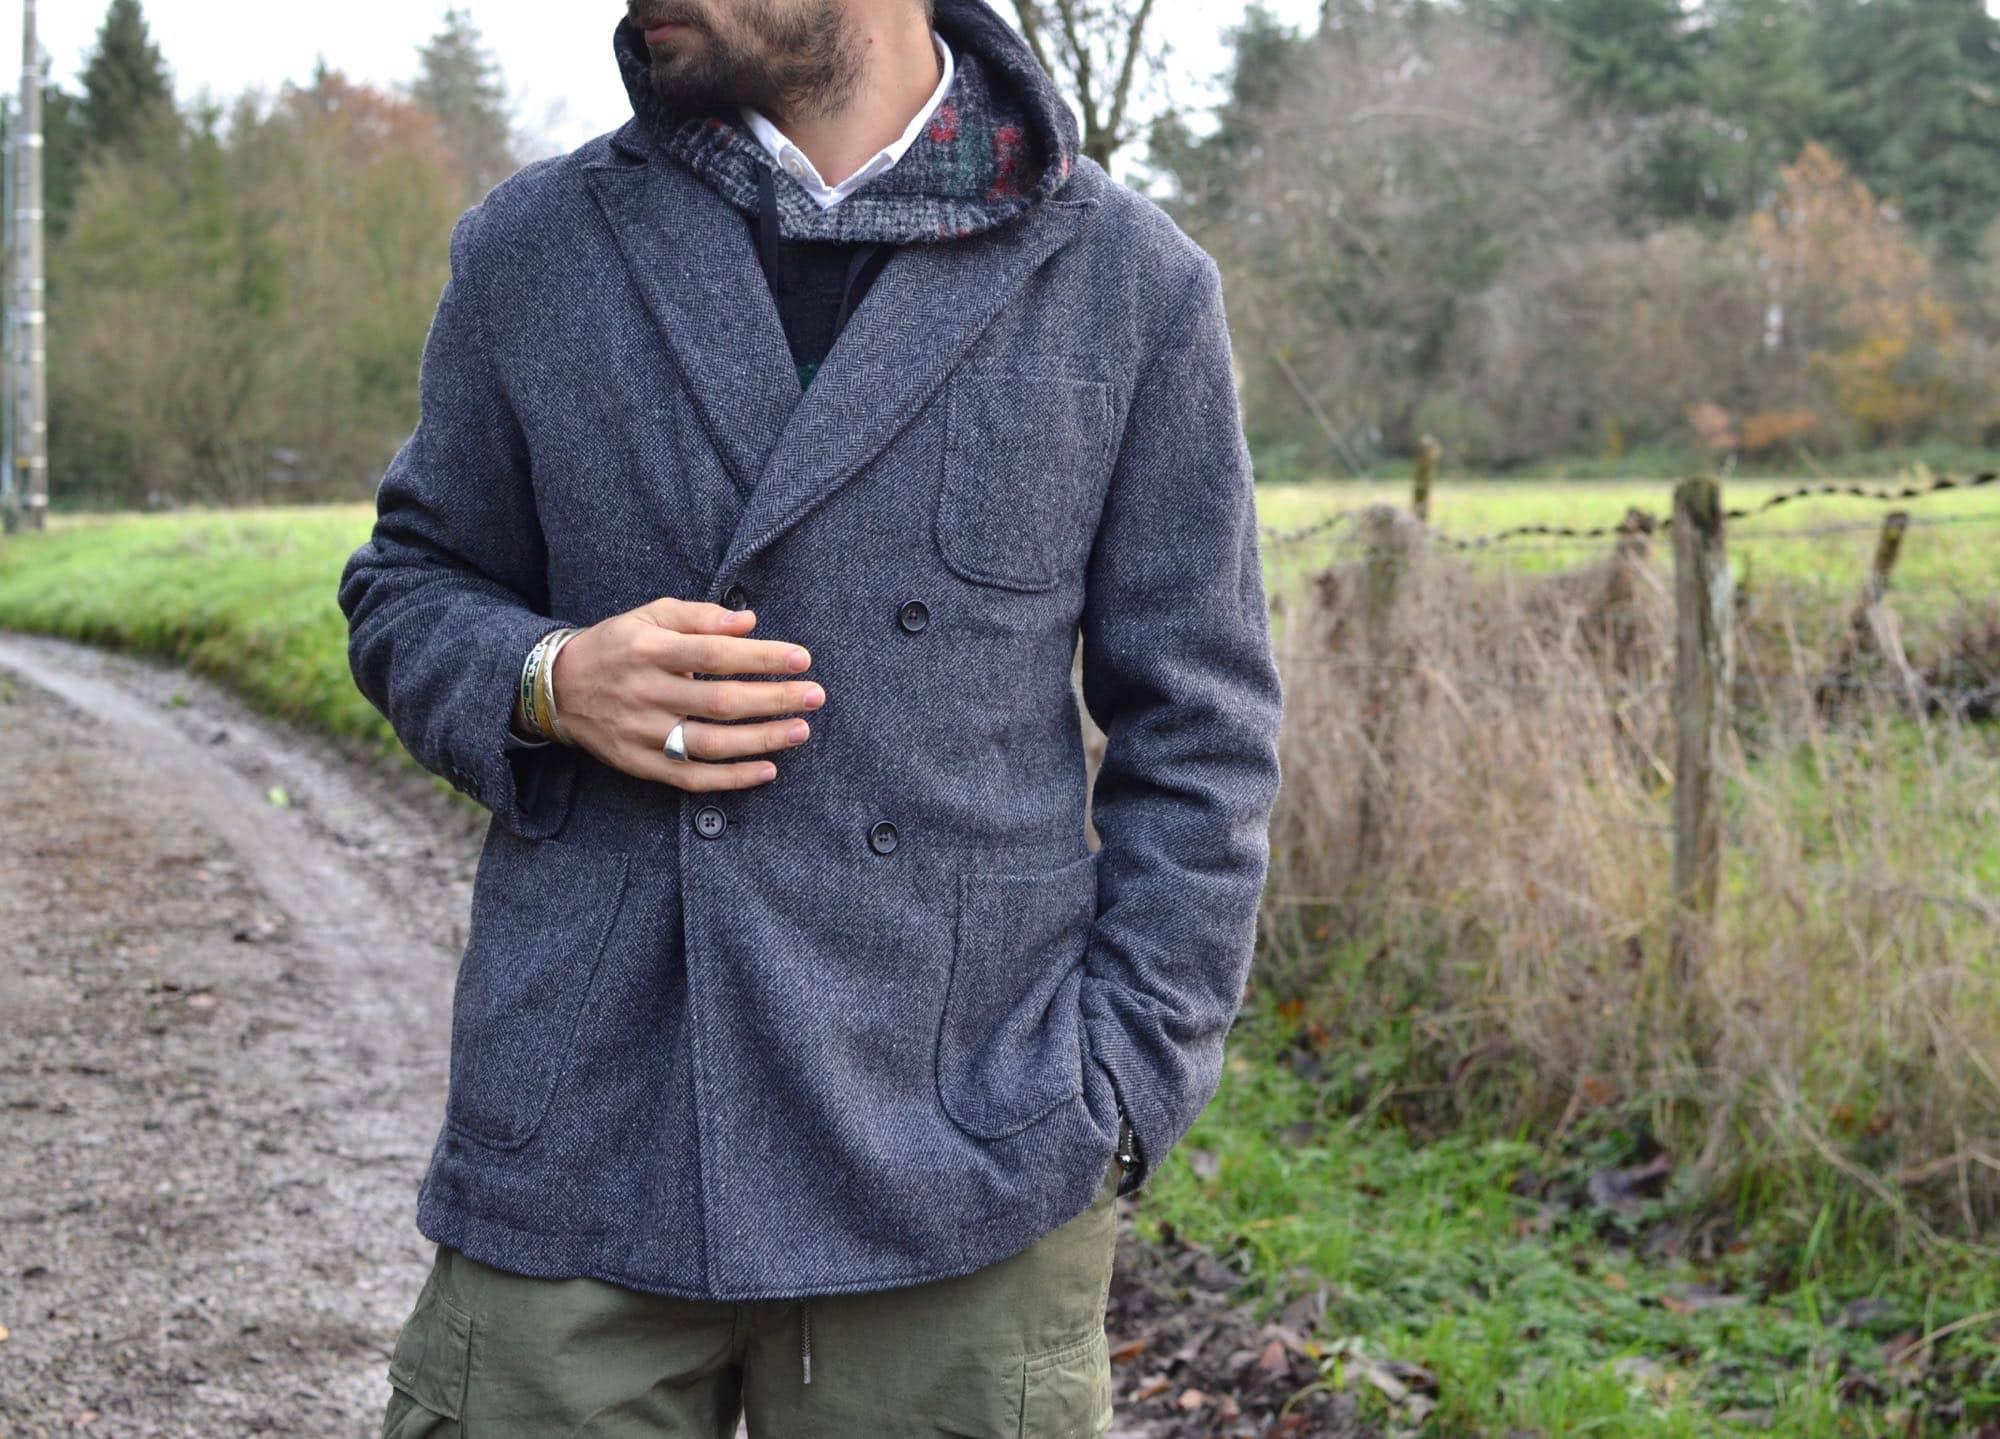 engineered garments double breasted dexter jacket wool herringbone - comment porter une veste croisée à chevrons dans un style homme workwear